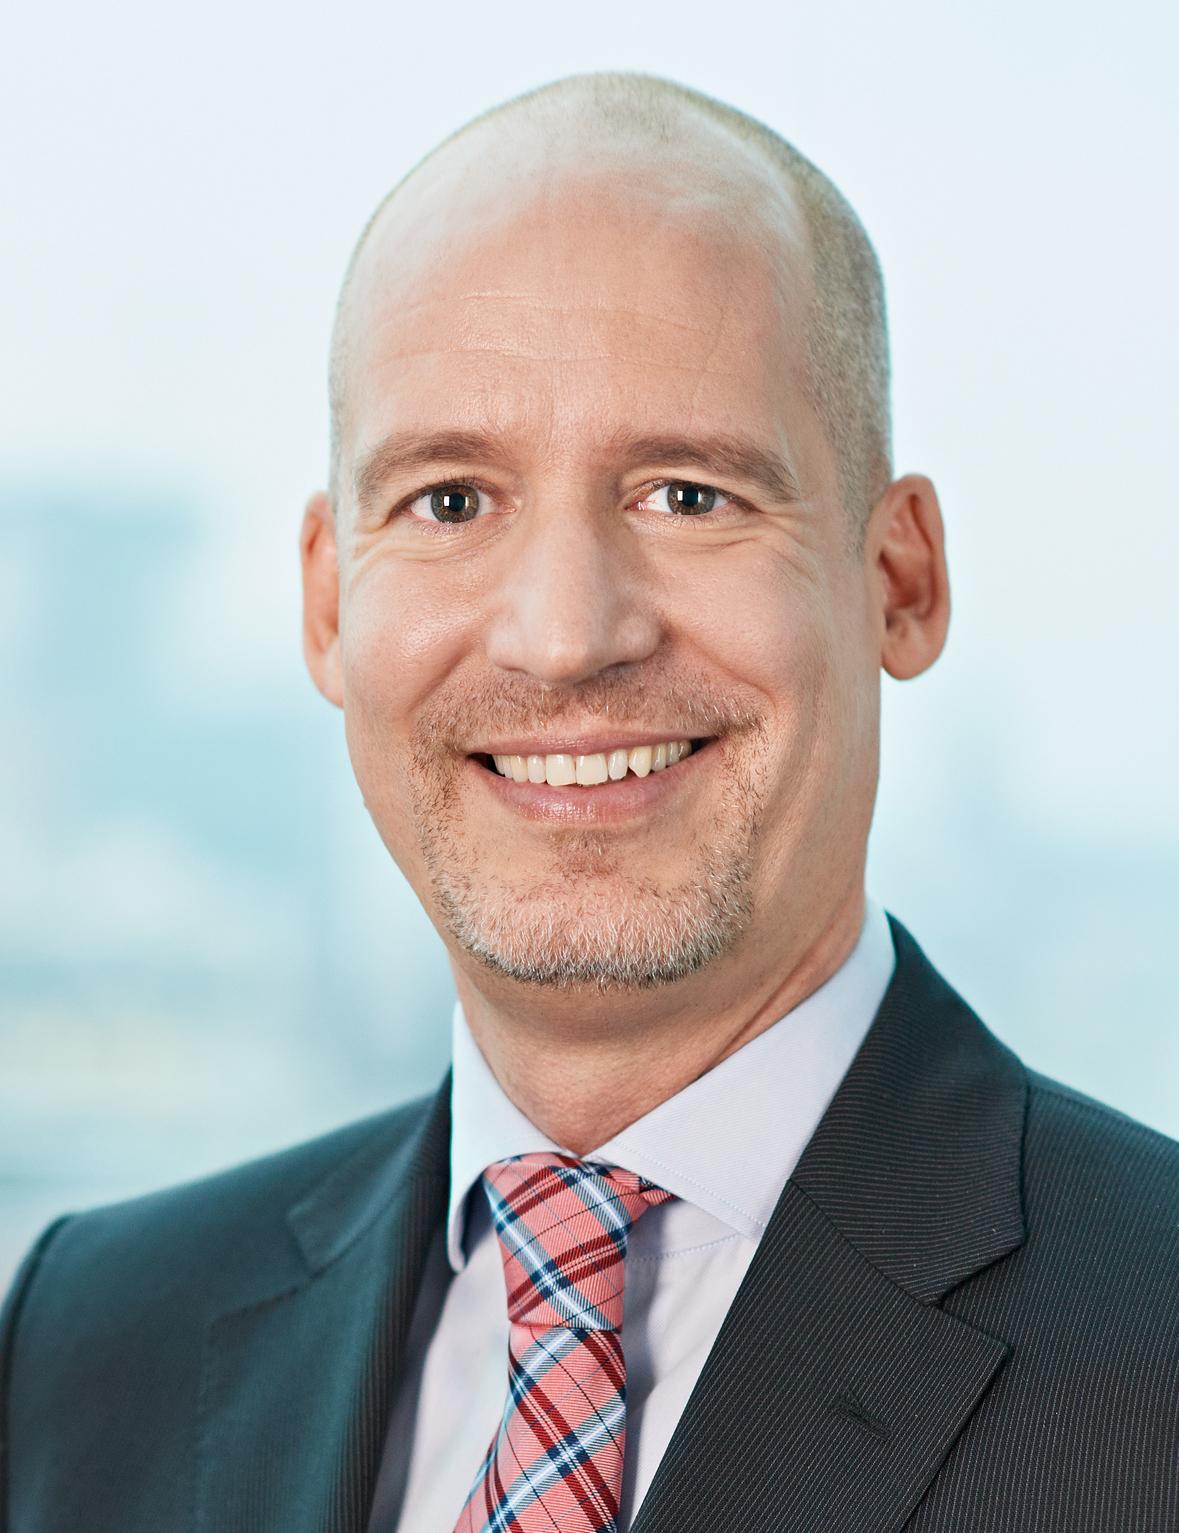 Stephan Jansen,  geschäftsführender Gesellschafter der M&A- und PMI-Beratung Beyond the Deal